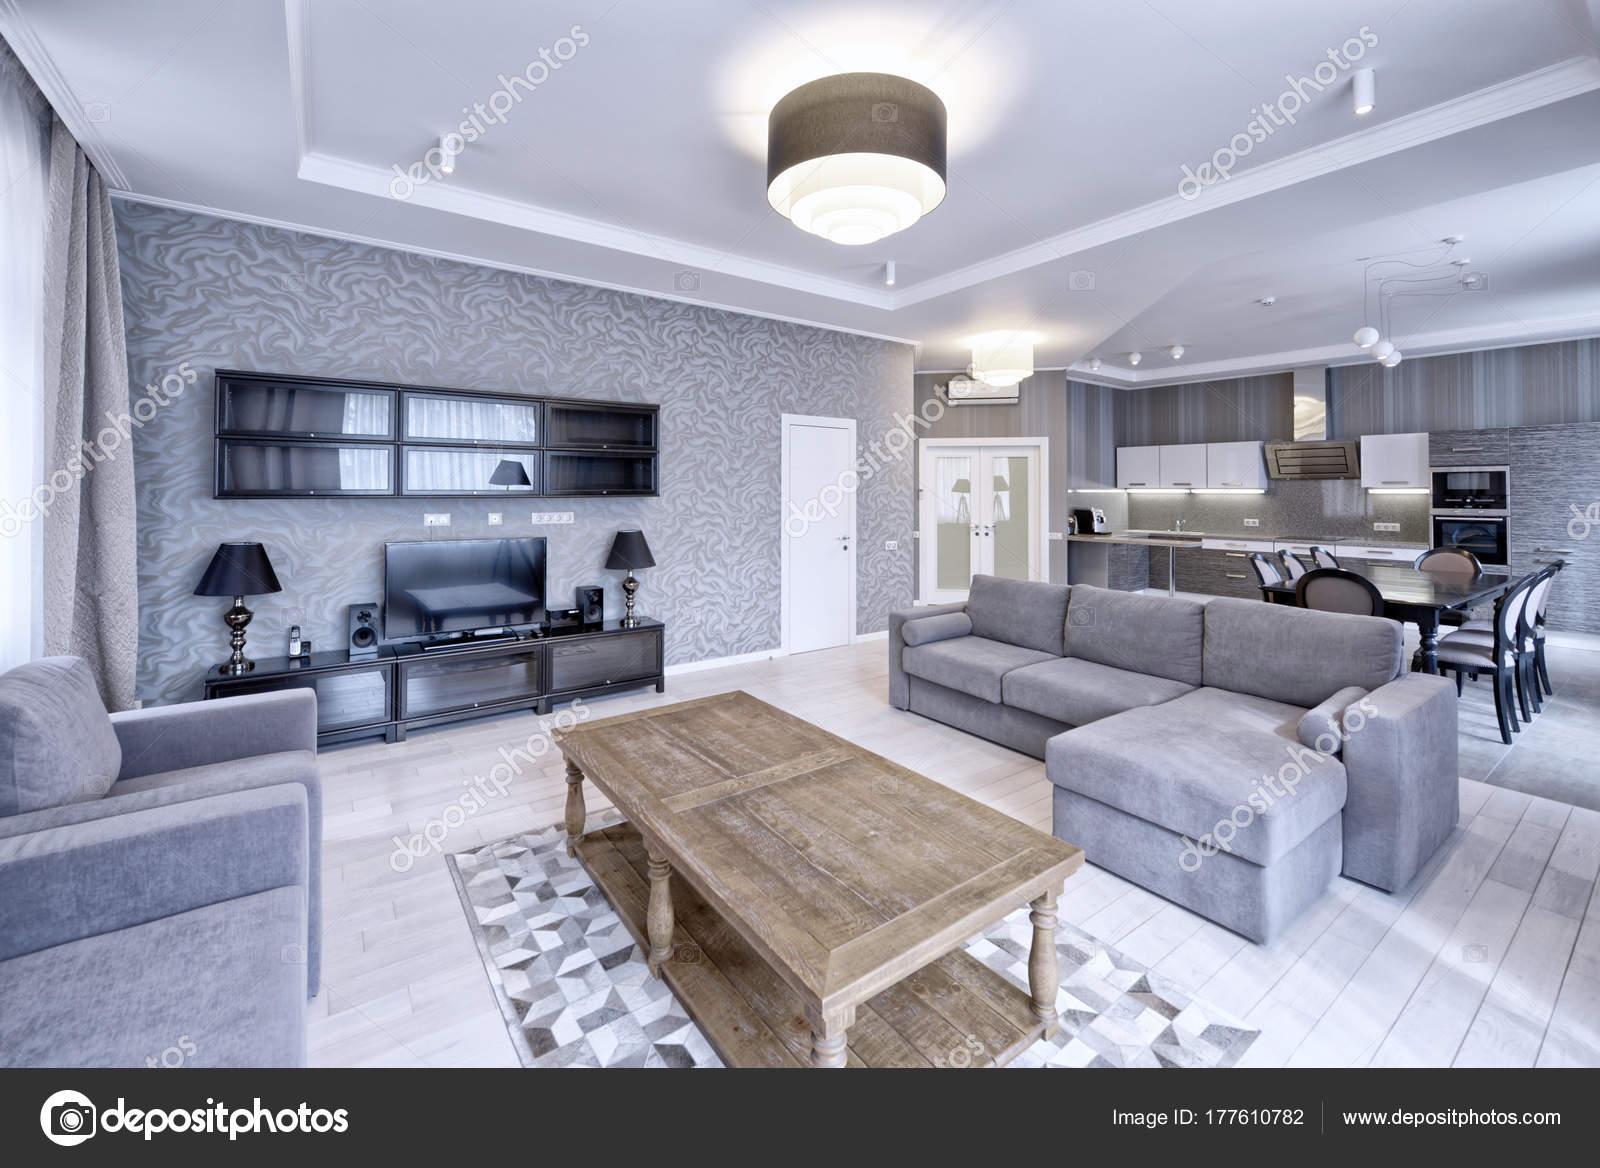 Interior Design Moderno Sala Estar Apartamento Luxo Tons Cinza Brancos U2014  Fotografia De Stock